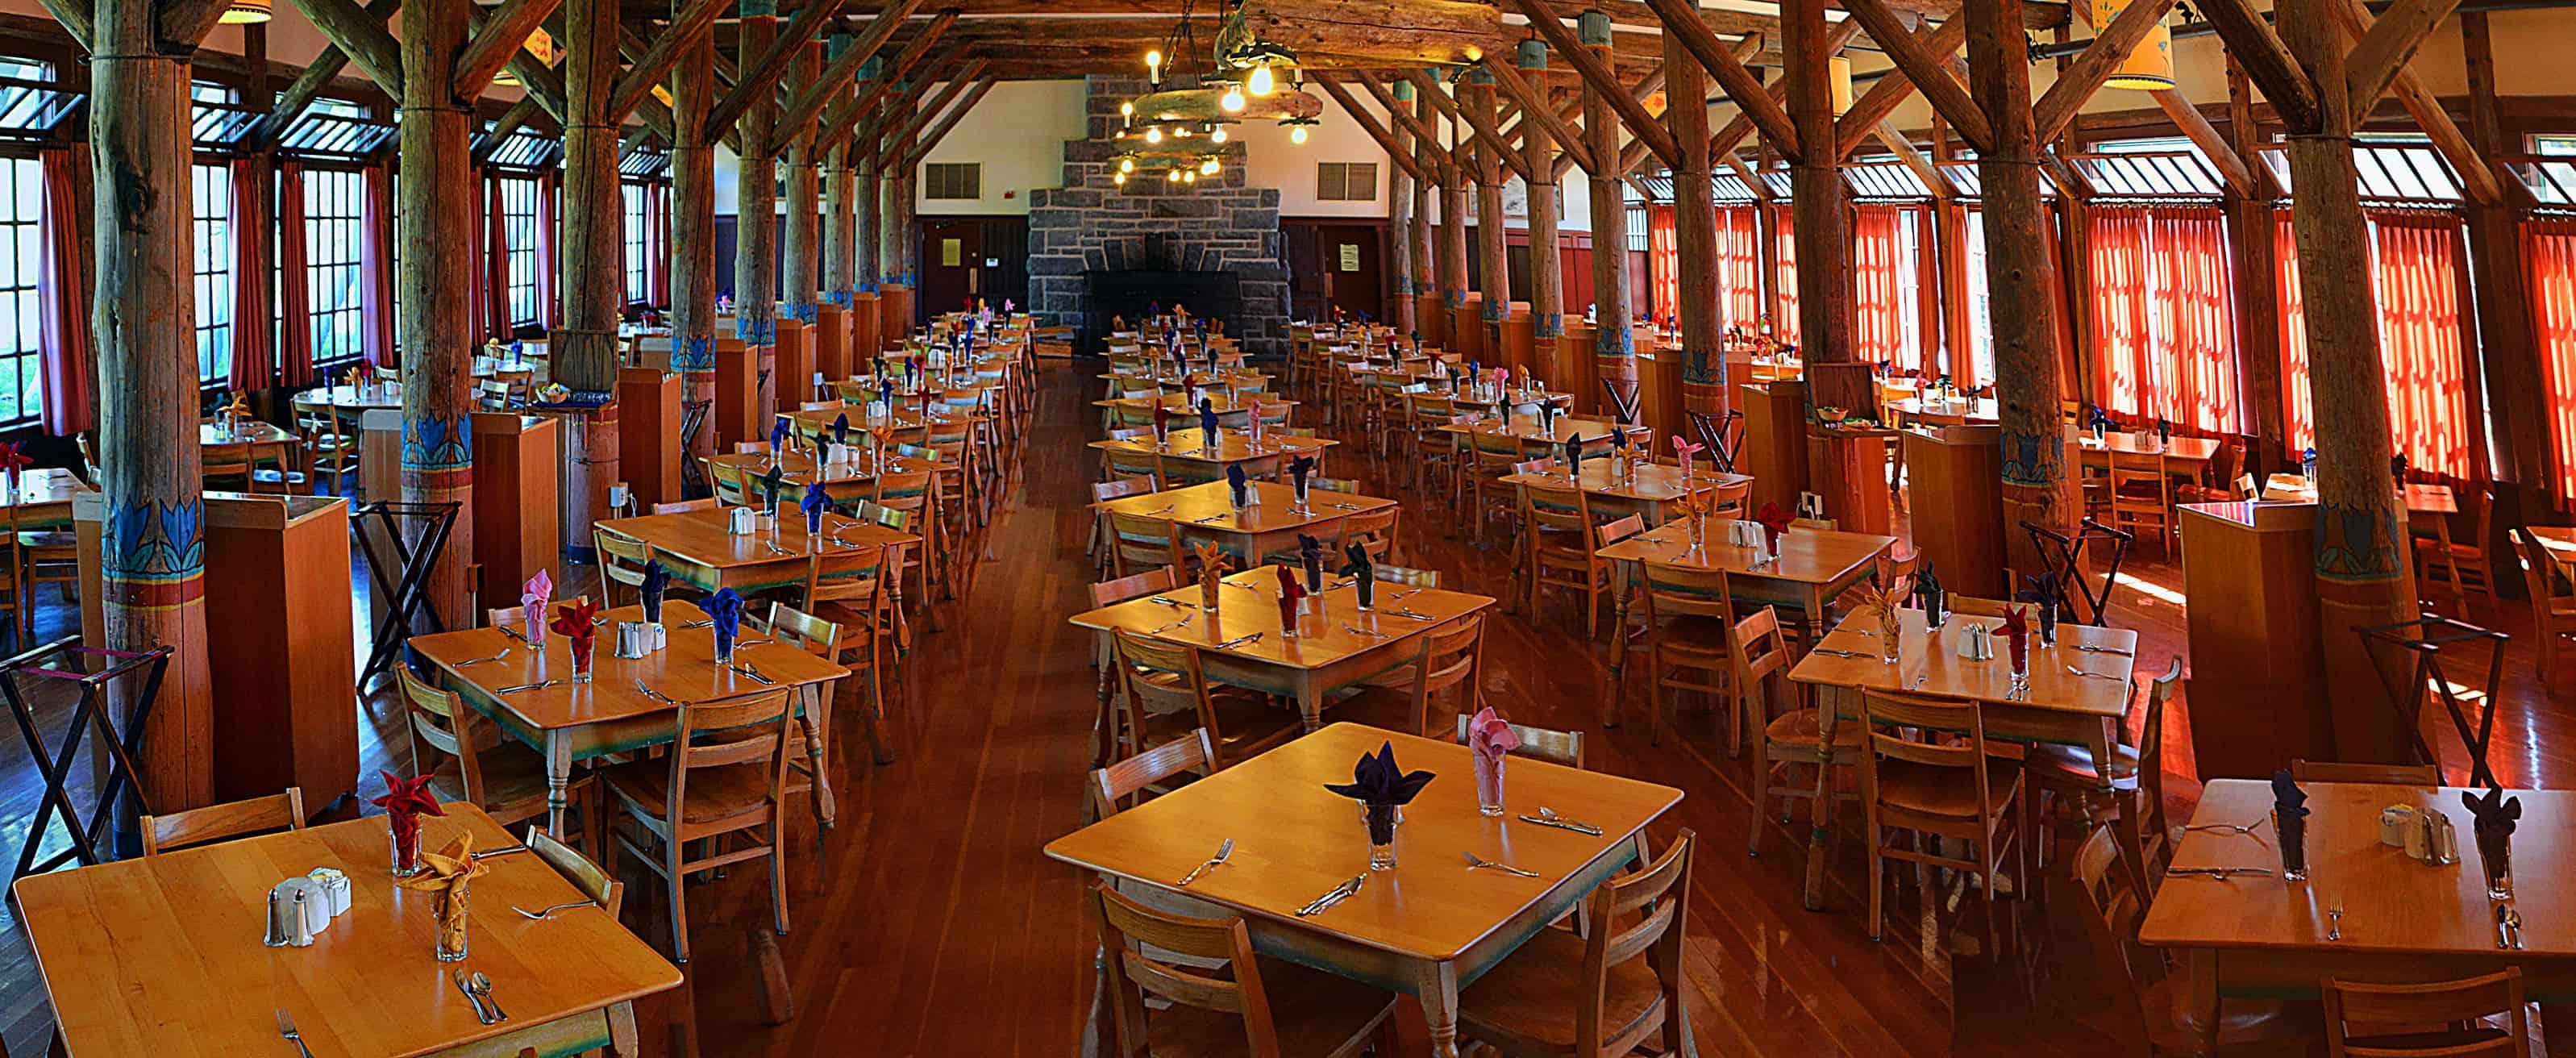 Paradise Inn Dining Room